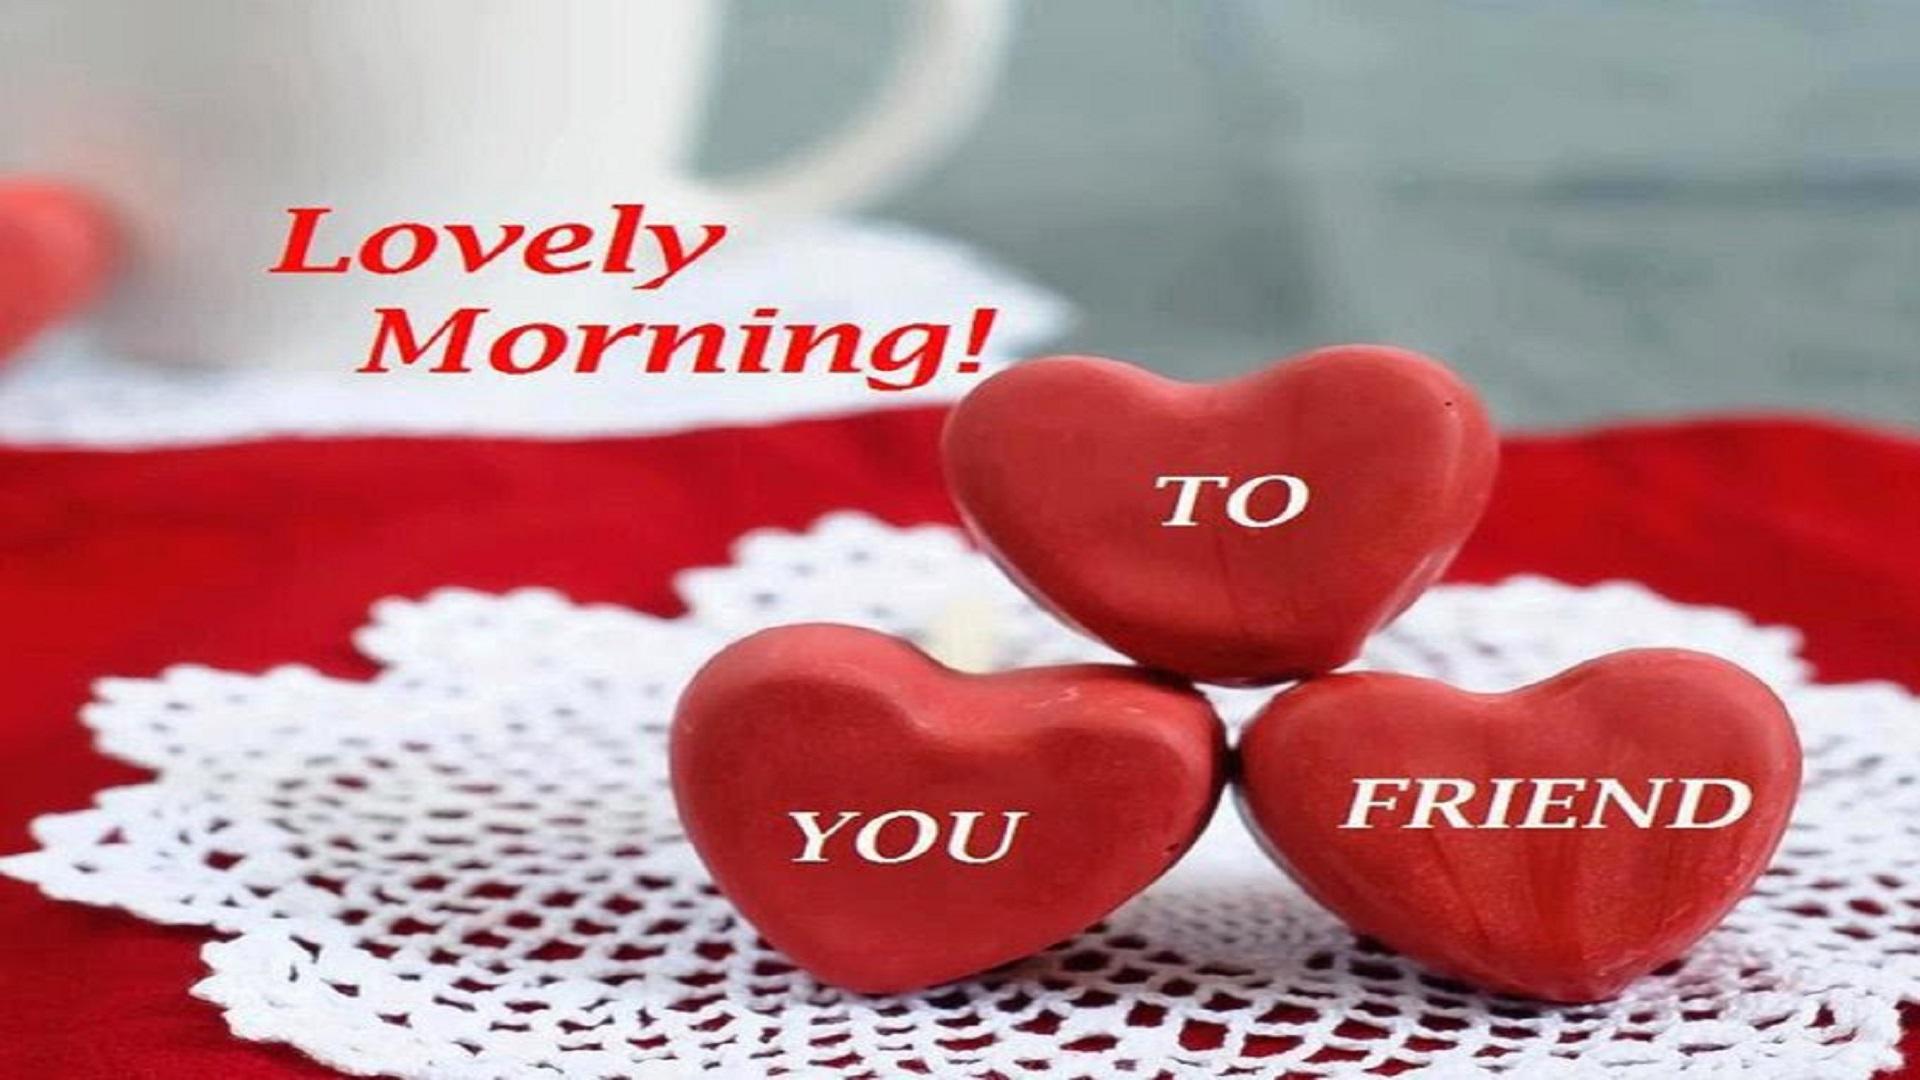 Good Morning Flowers Wallpaper Free Hd Hd Wallpaper